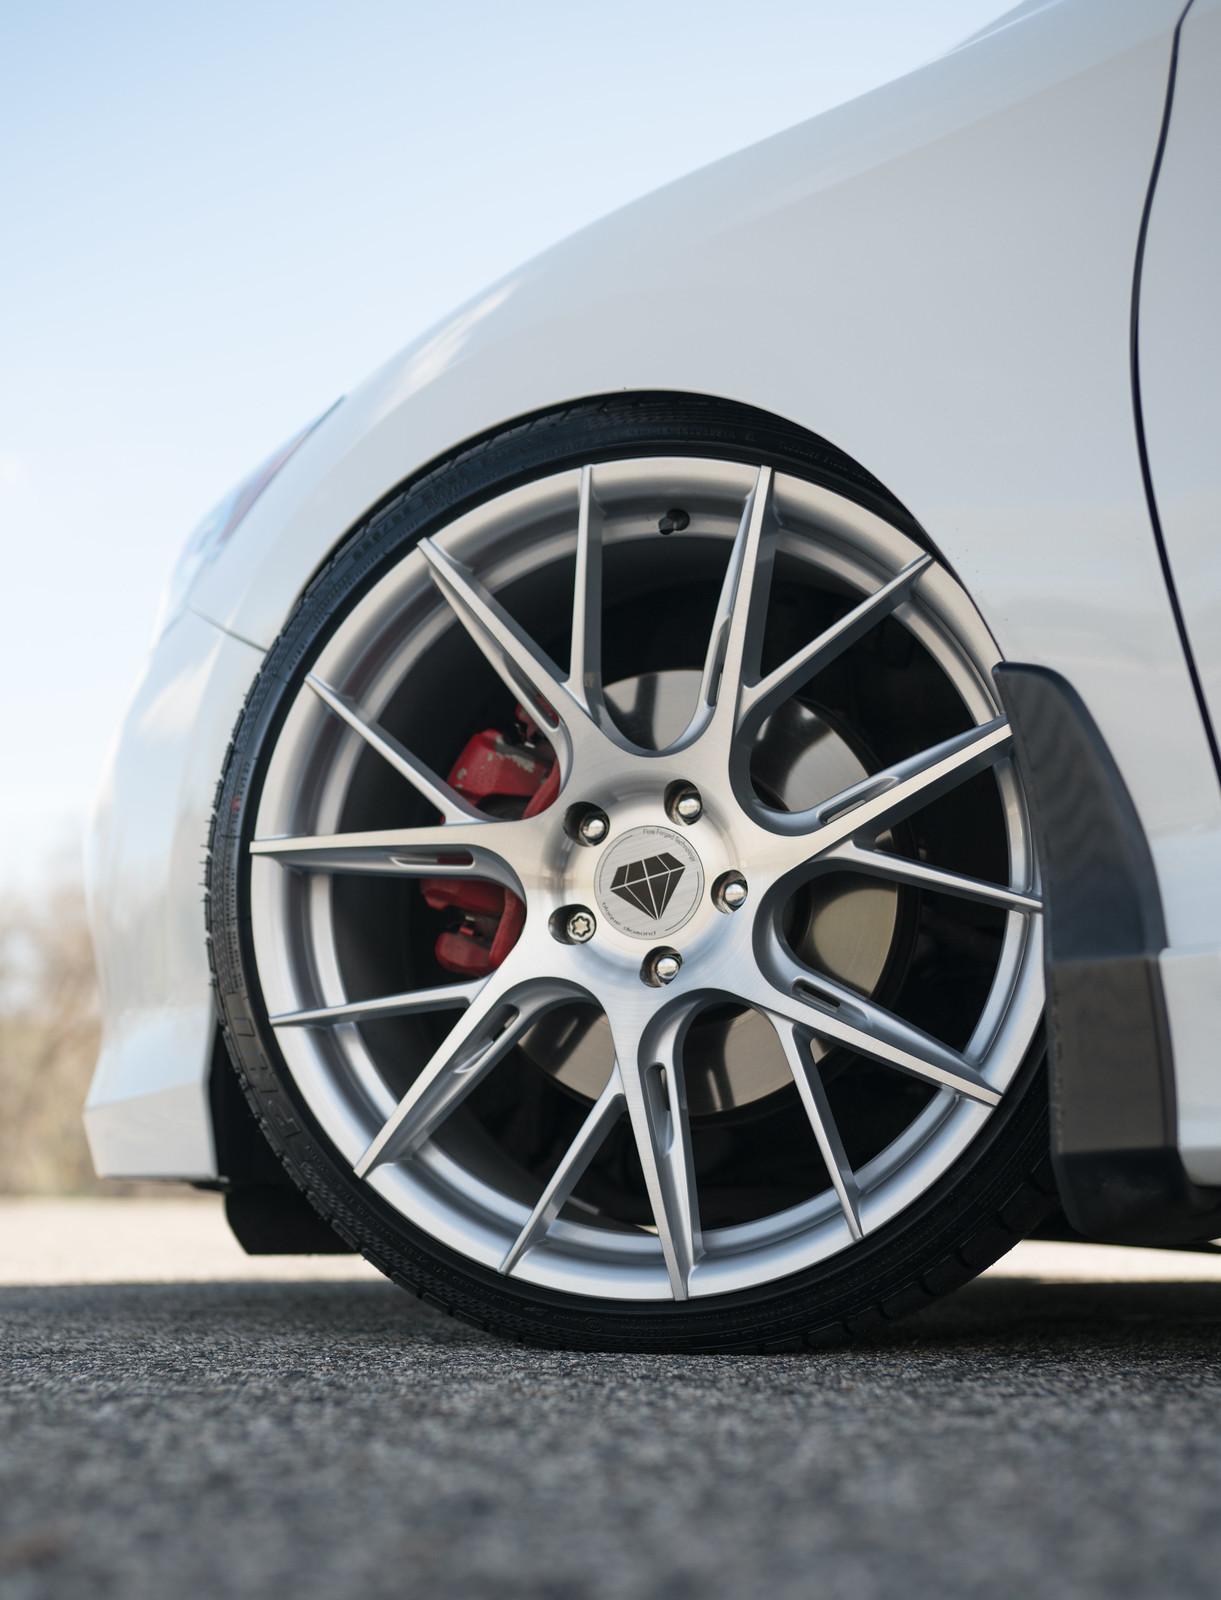 2017_Honda_Accord_Blaque_Diamond_Wheels_BD-F18_Wheels_Brushed_Silver (4)